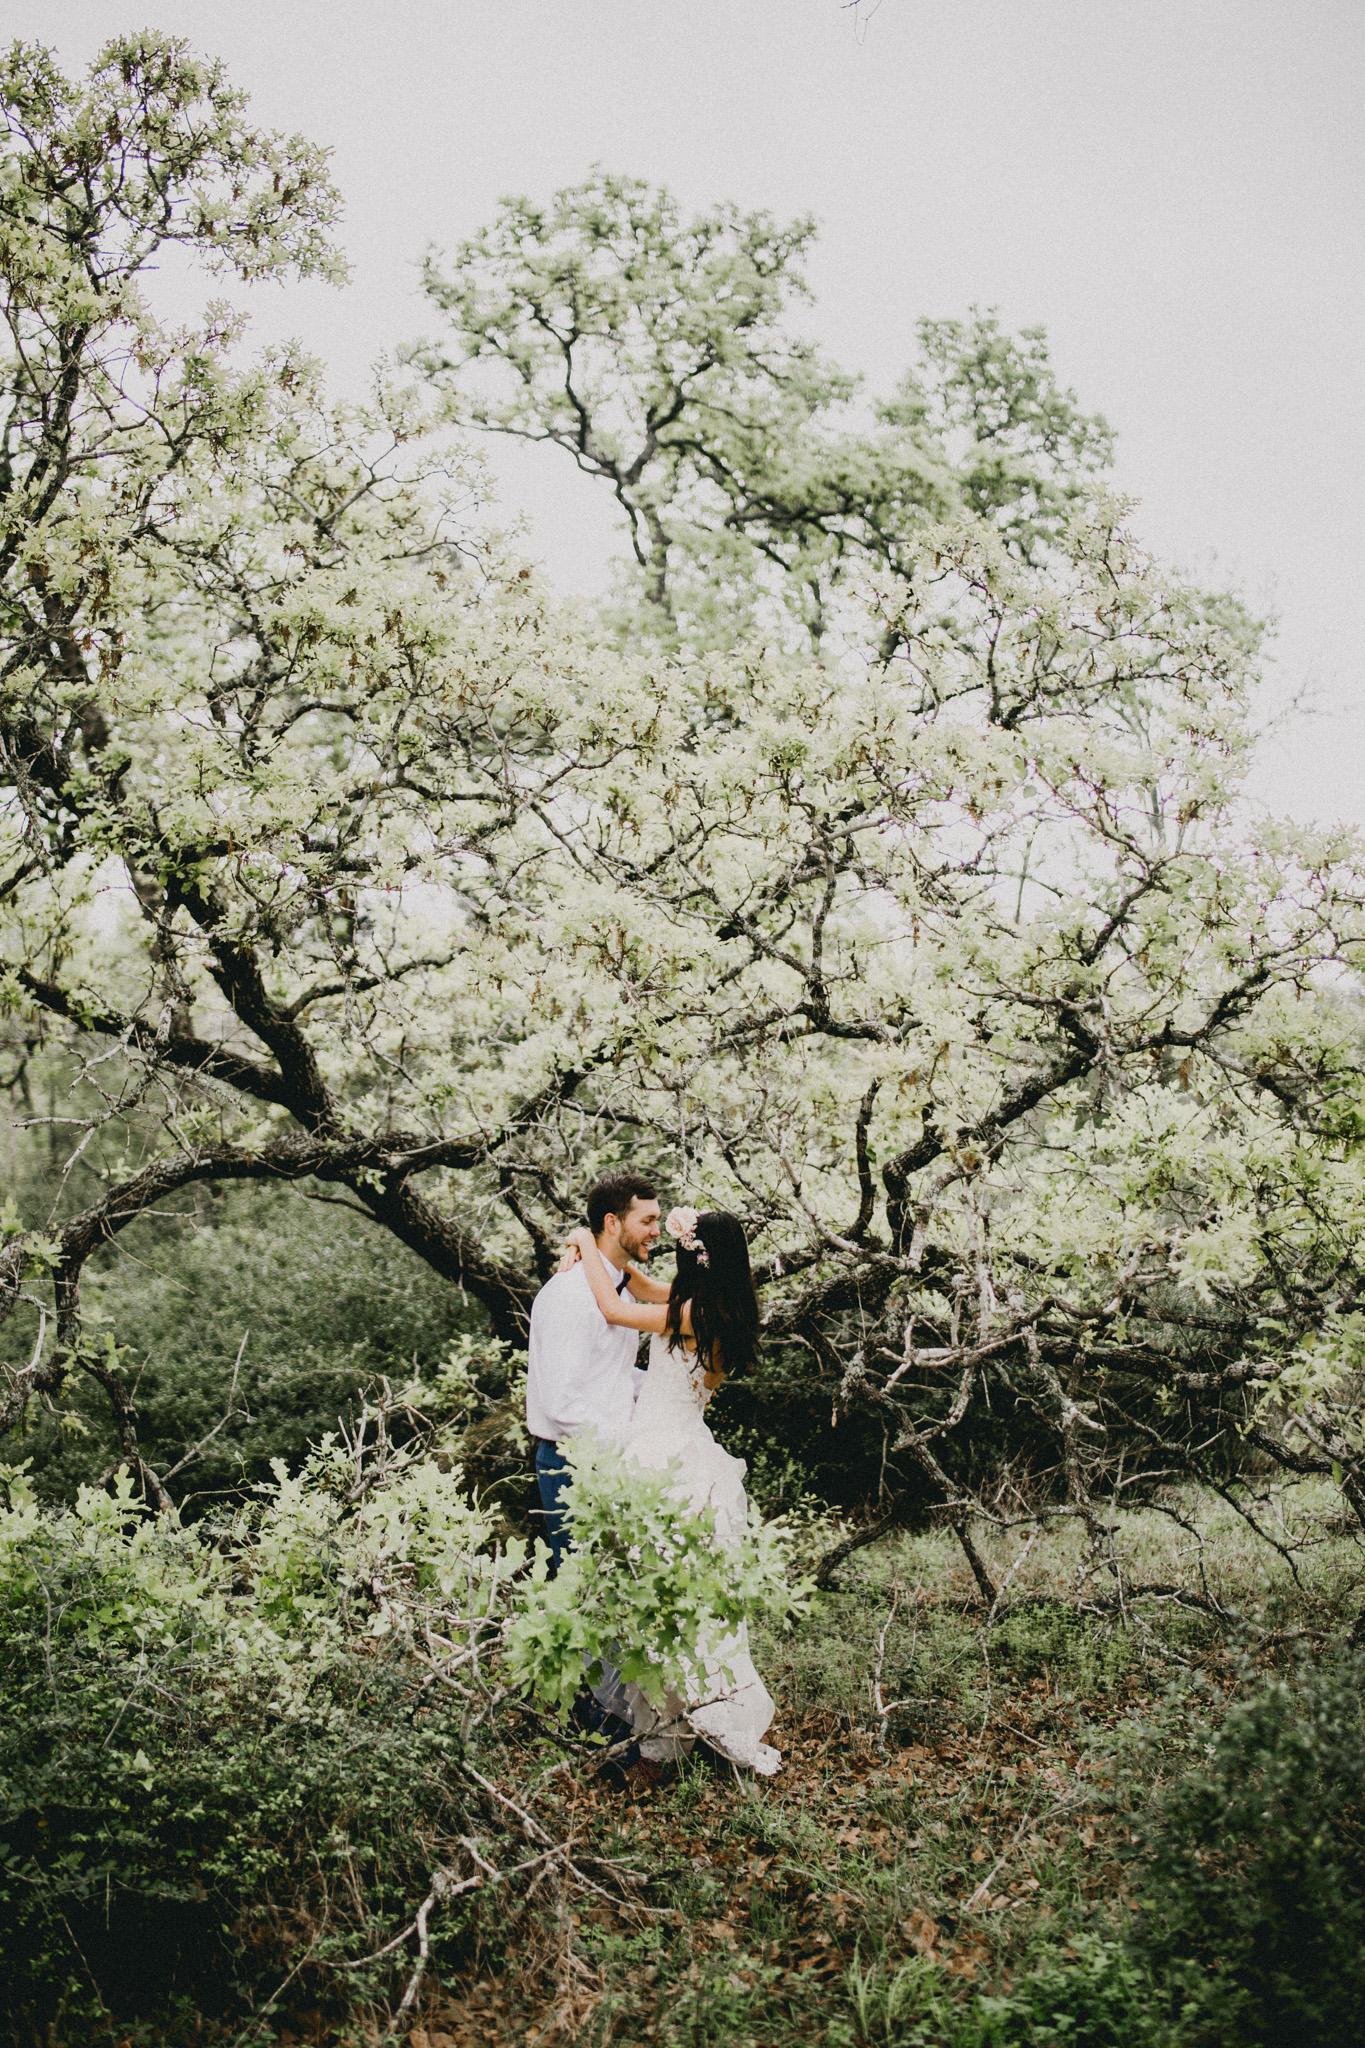 Breshears After Bridal Session Blog-37.jpg